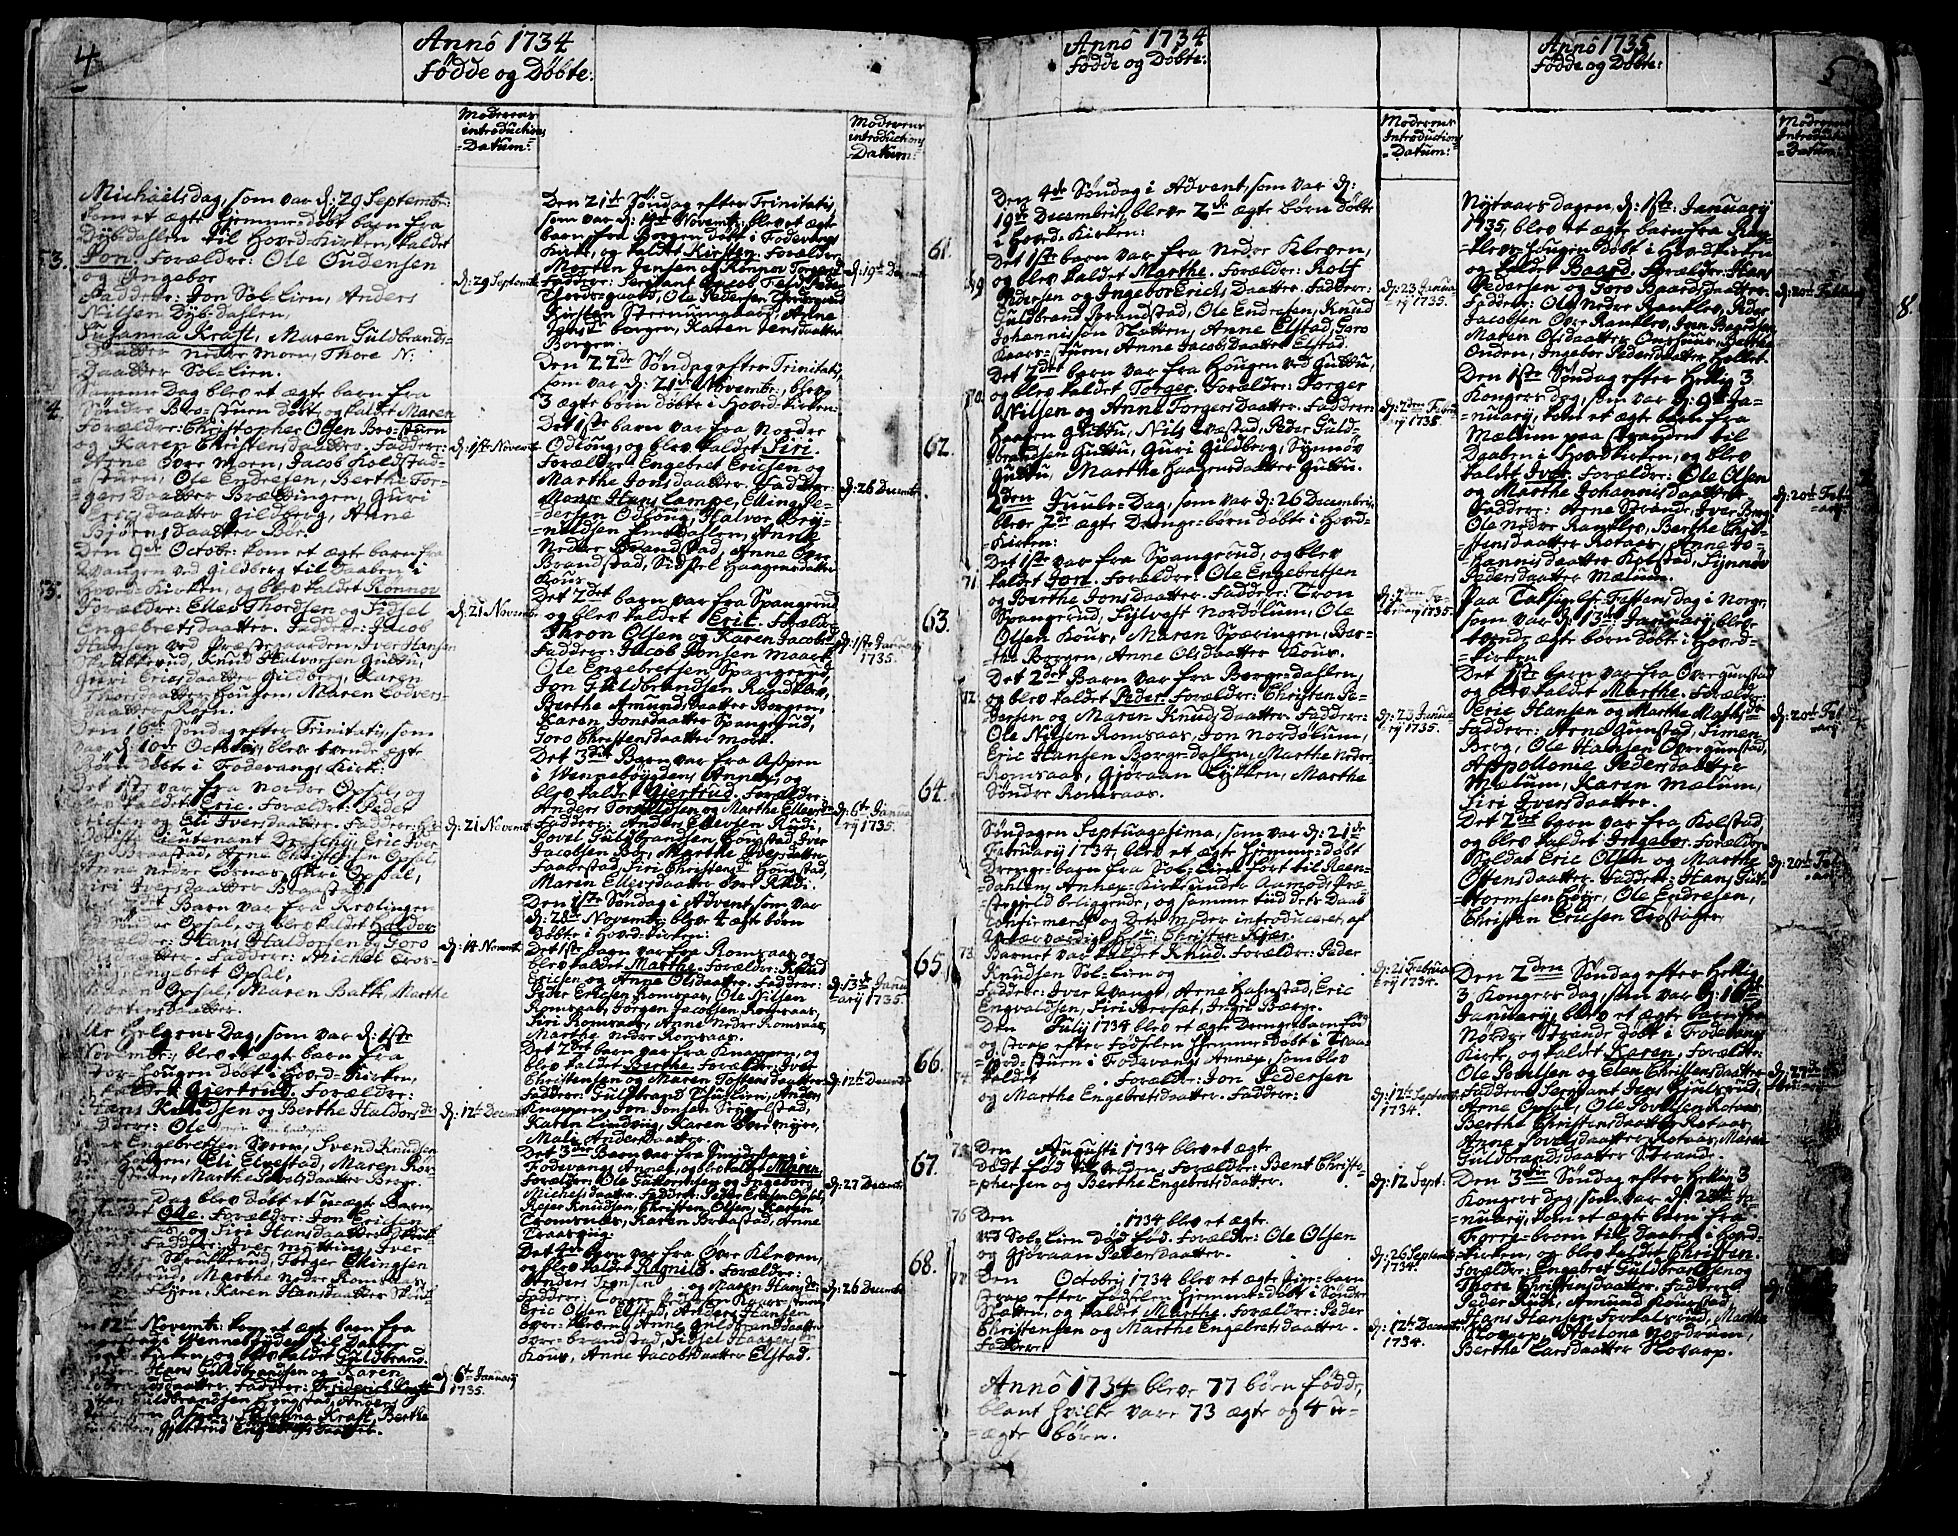 SAH, Ringebu prestekontor, Ministerialbok nr. 2, 1734-1780, s. 4-5